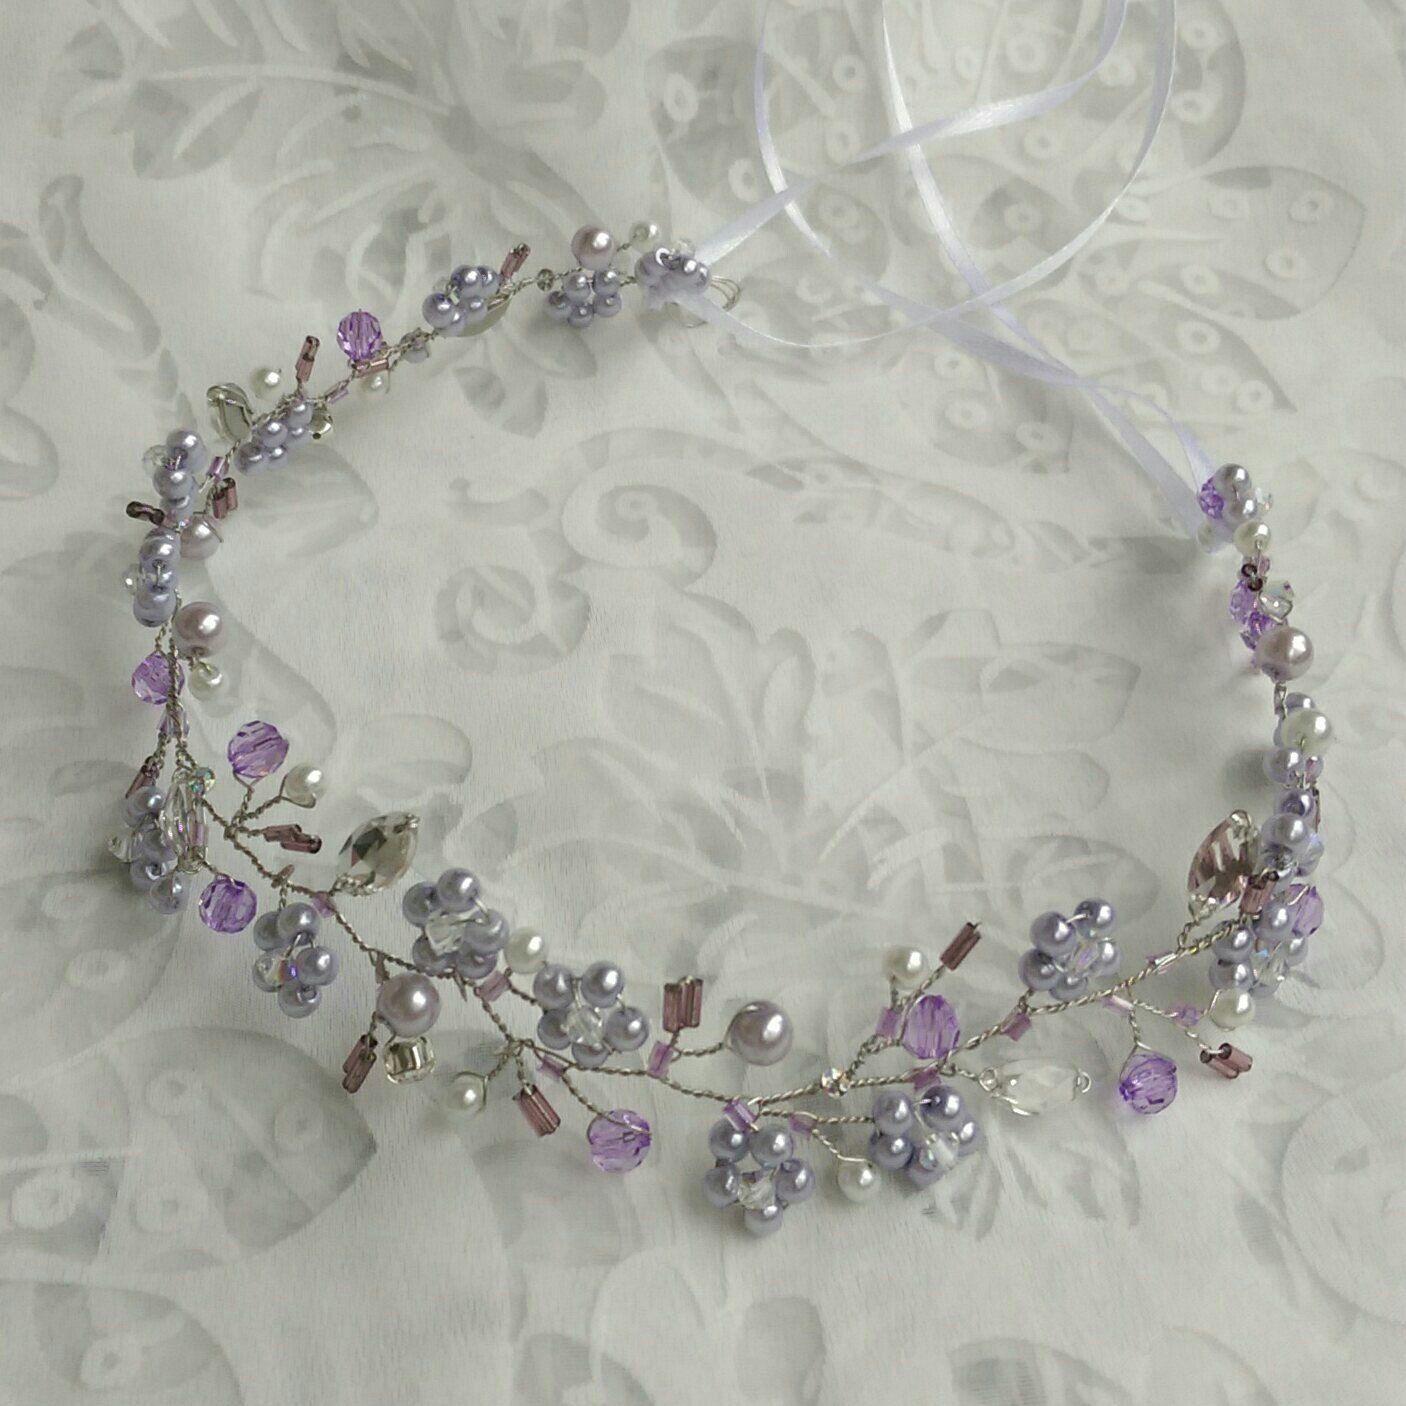 Bridal hair vine, breidl wreath, bridal halo, hair accessoire, lavender by RoyalAccessoriesAE on Etsy